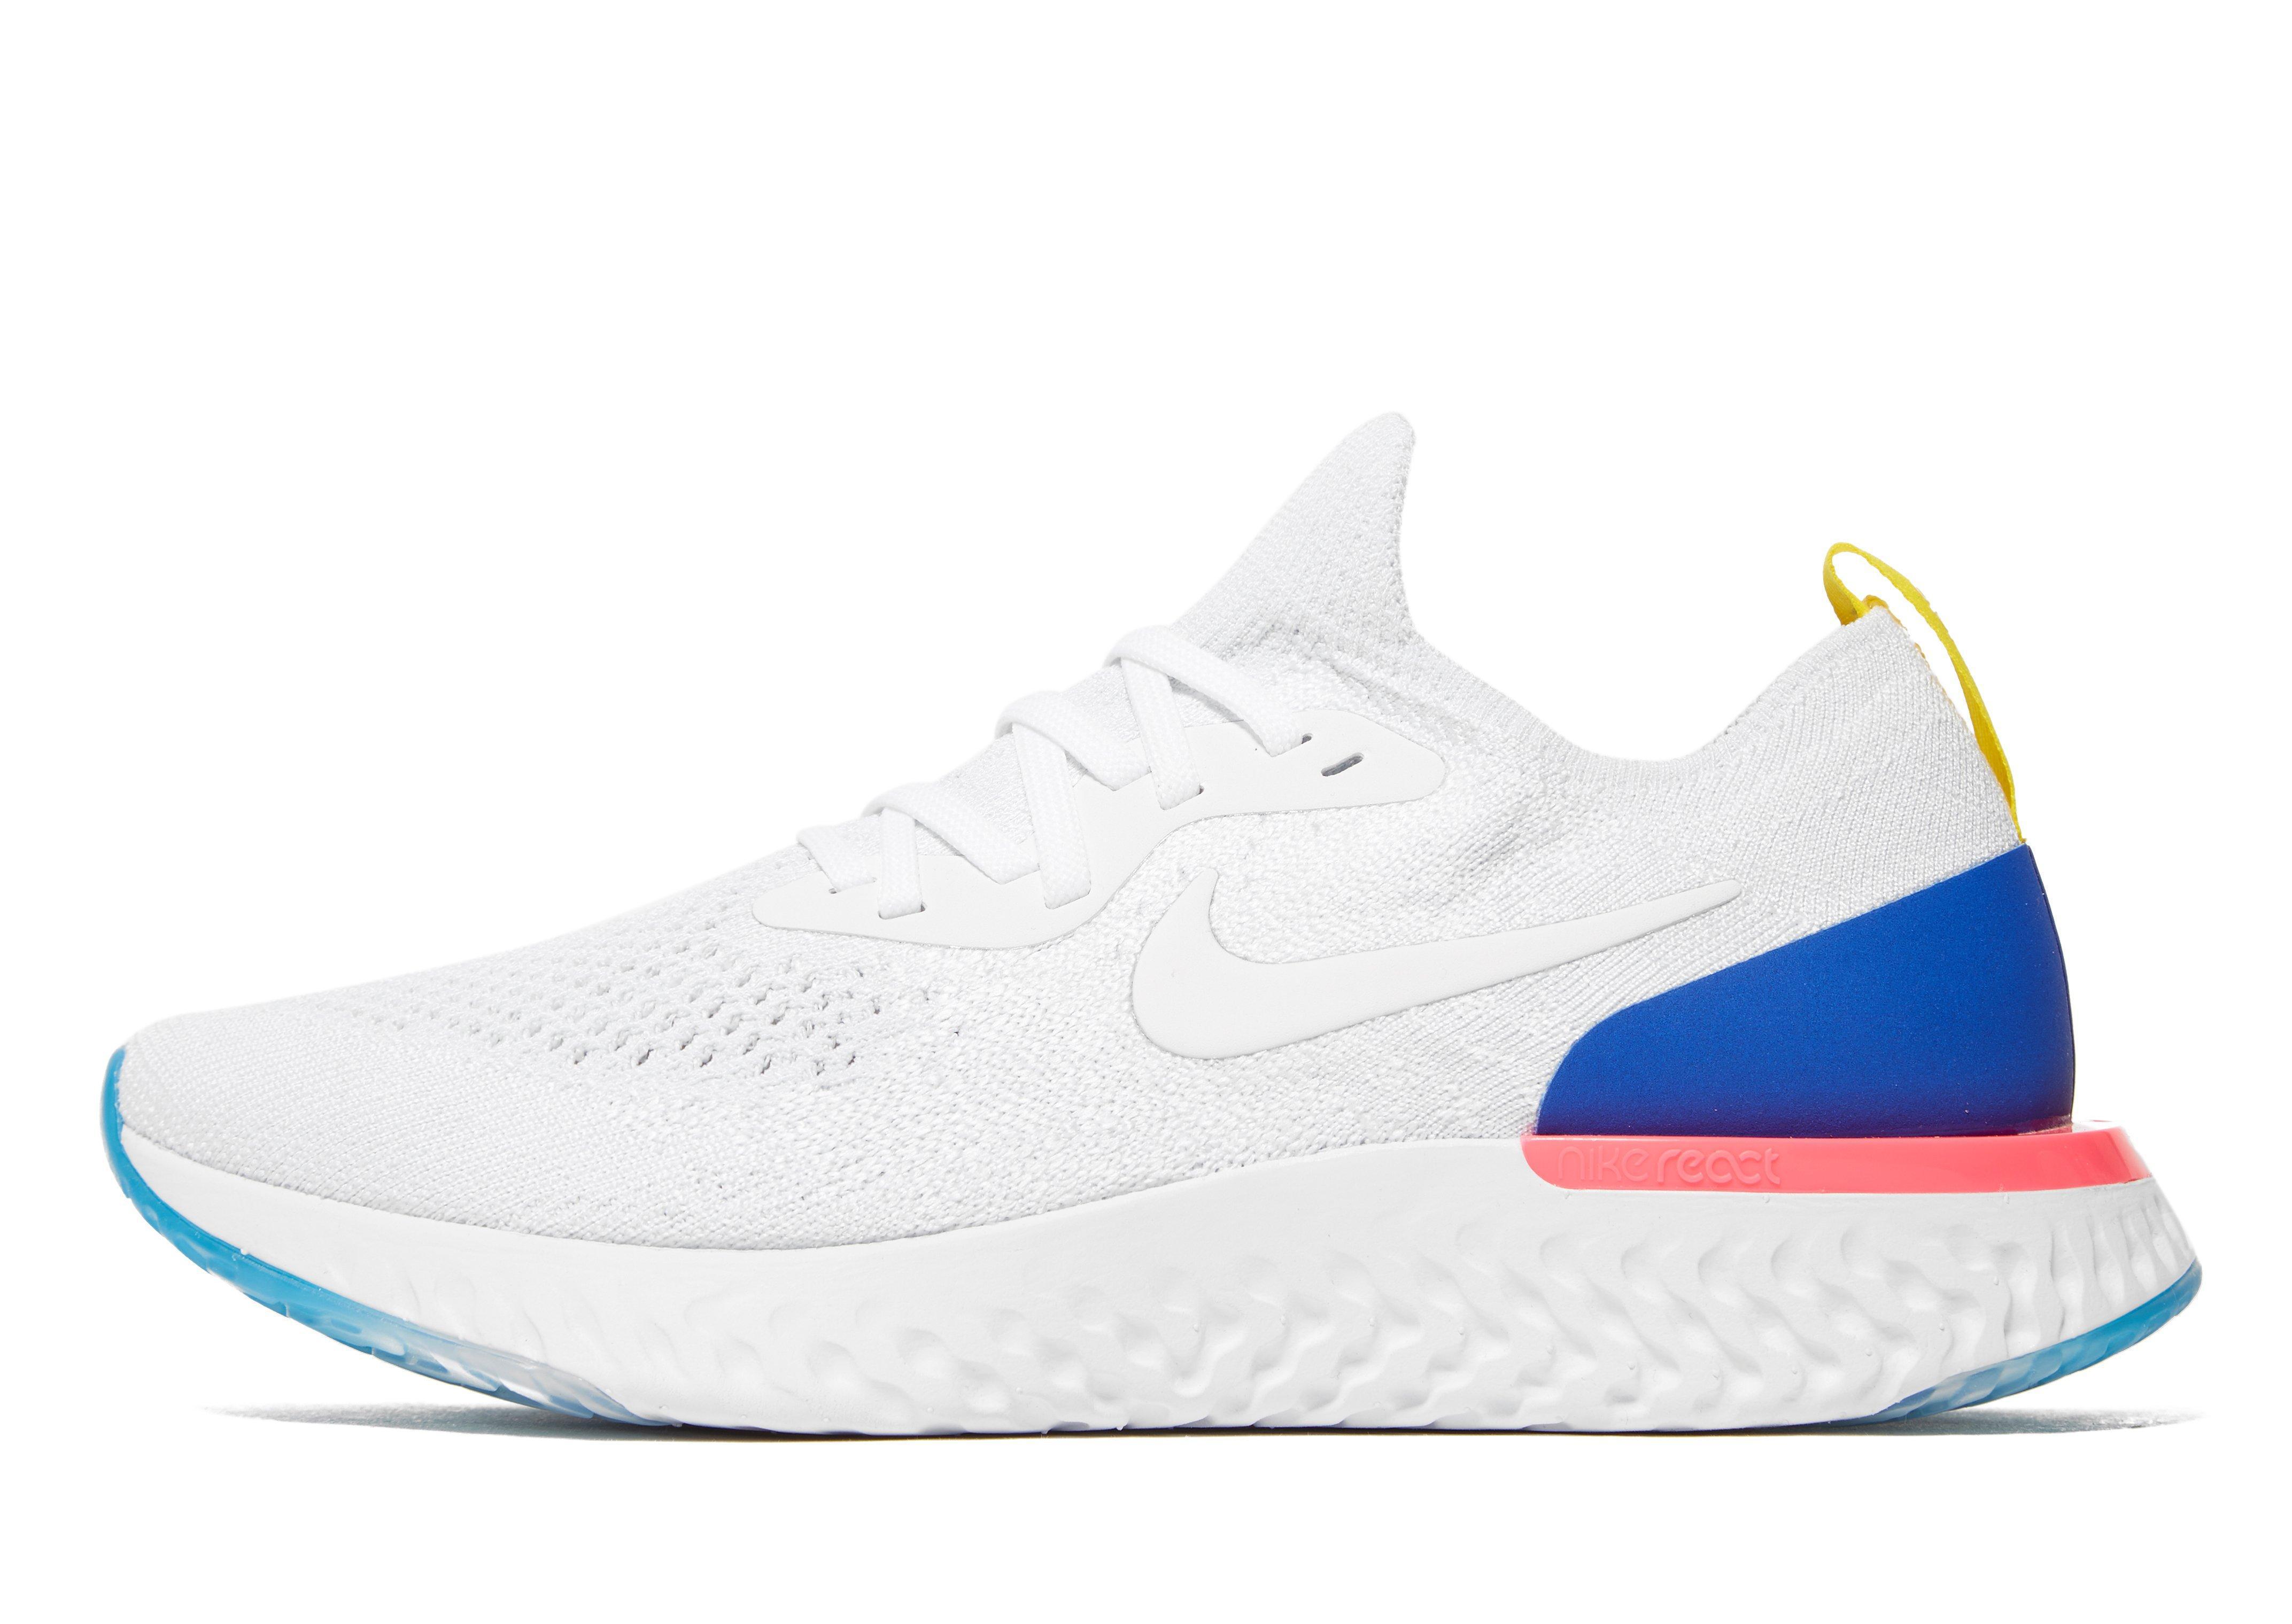 d2922ad026b3 Lyst - Nike Epic React Flyknit in Blue for Men